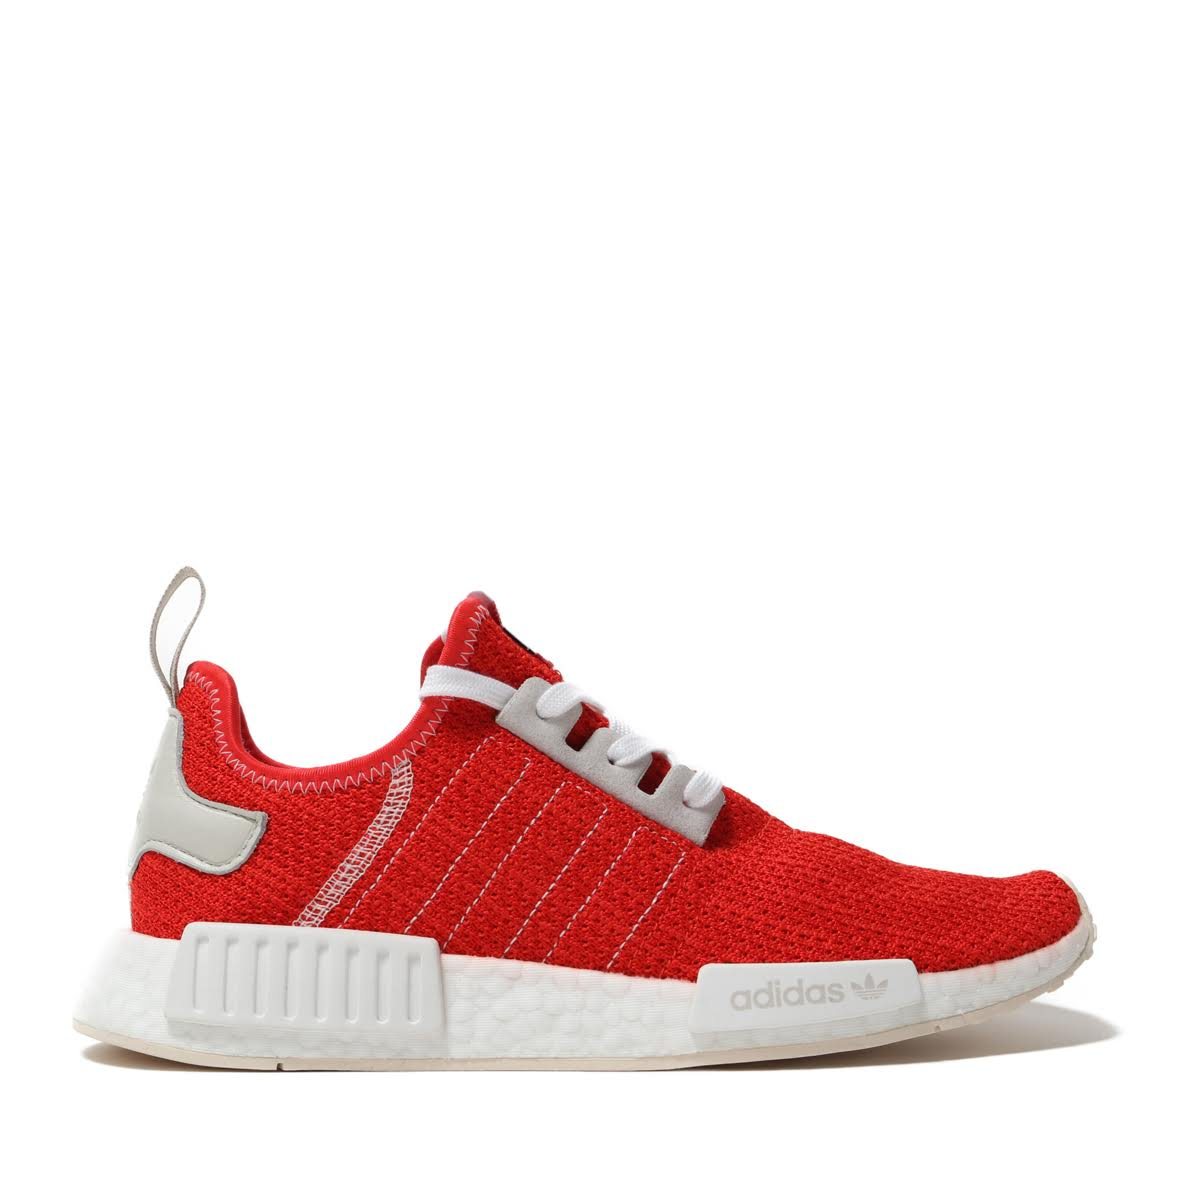 adidas Originals NMD_R1(ACTIVE RED/ACTIVE RED/ECRU TINT S18)(アディダスオリジナルス NMD_R1)【メンズ】【スニーカー】【19SS-I】